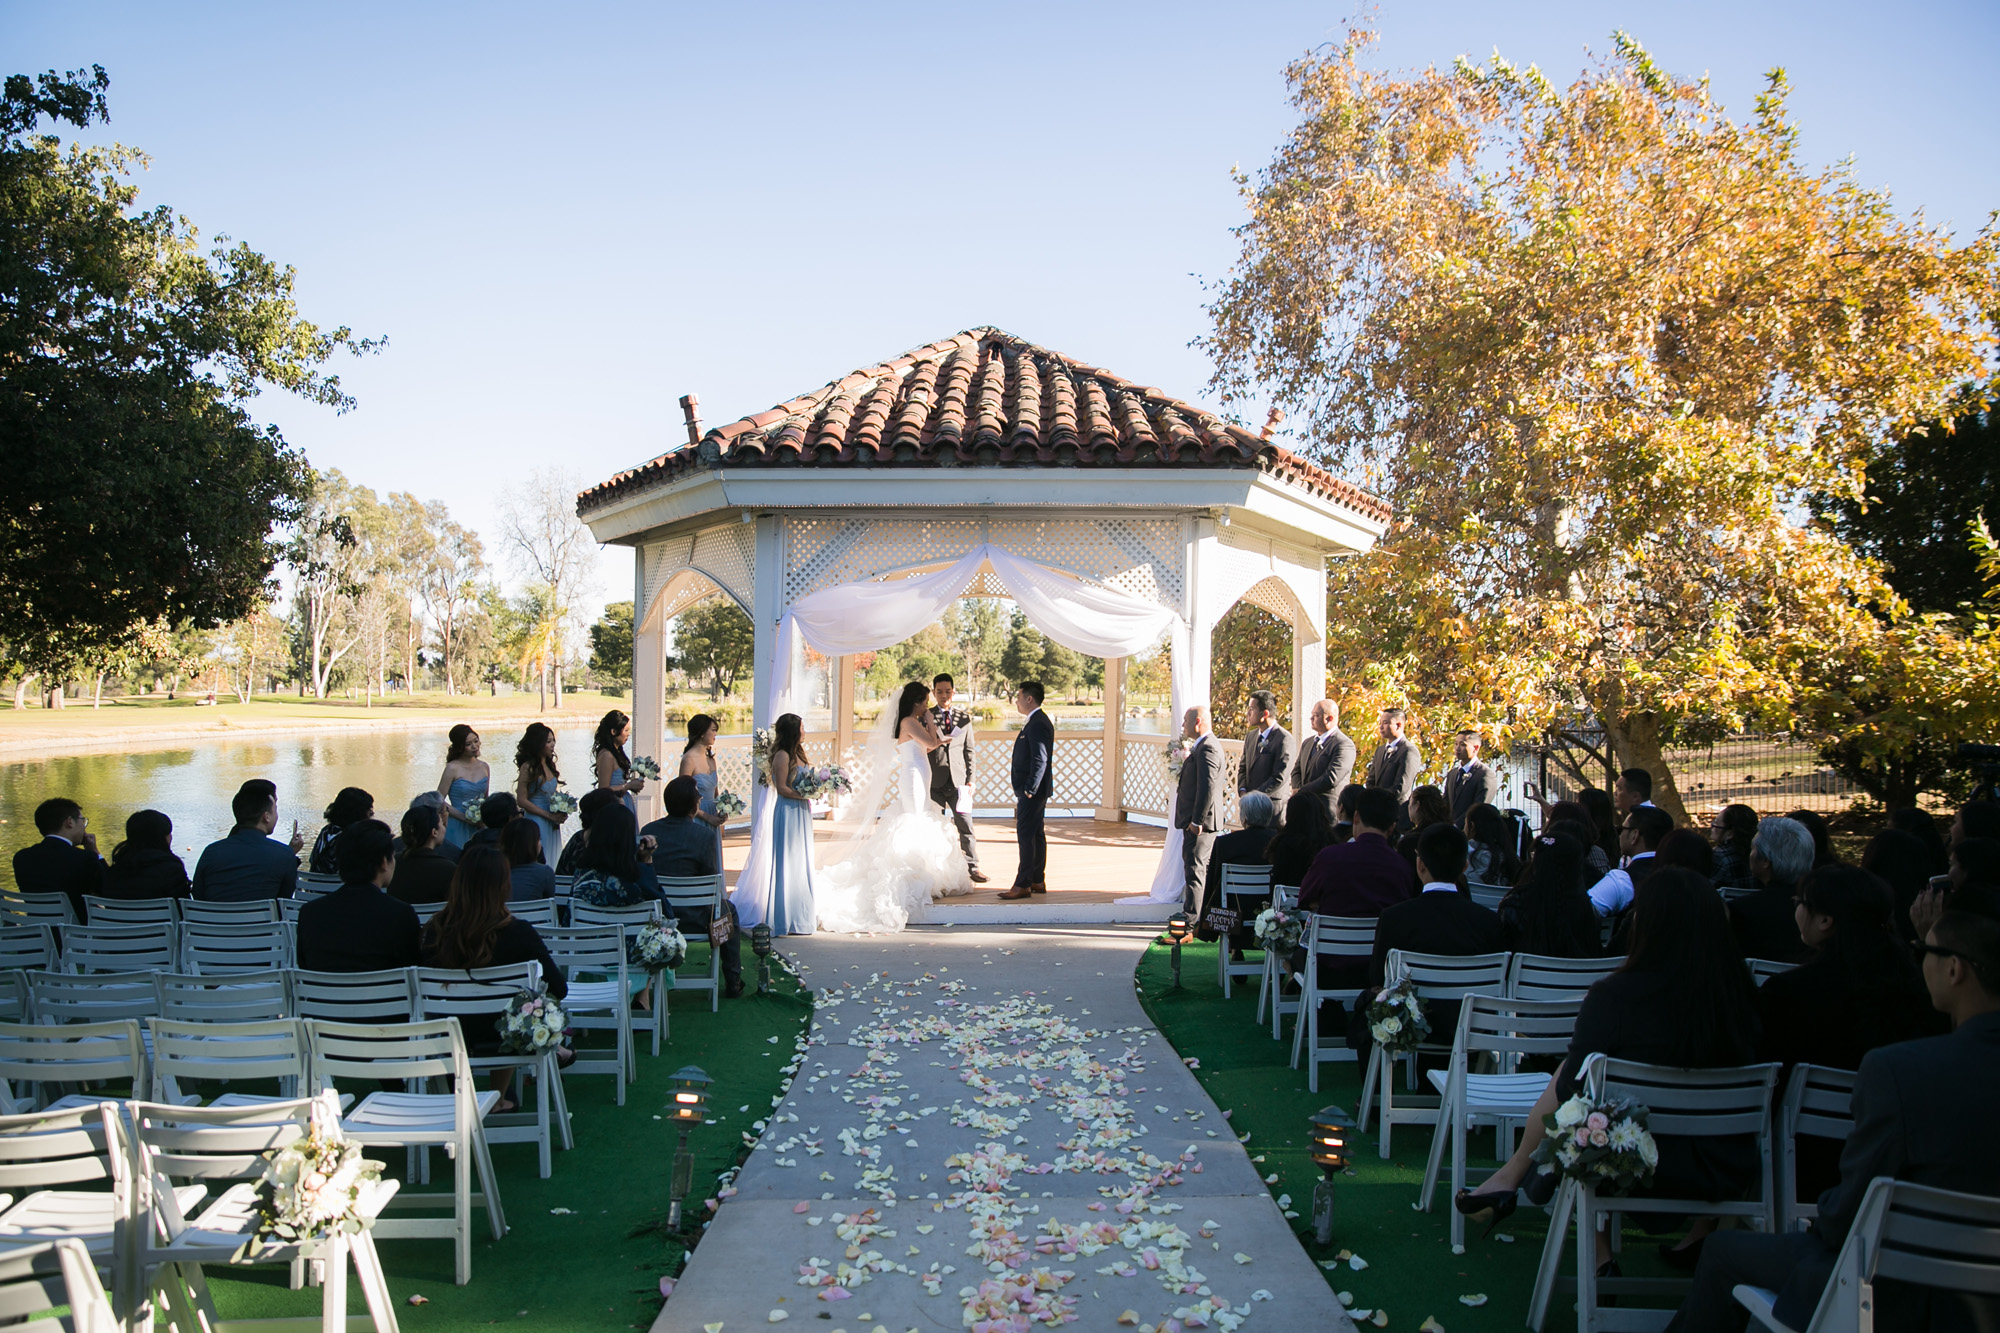 Geoff Kowalchuk JT Wedding Photo-012.jpg